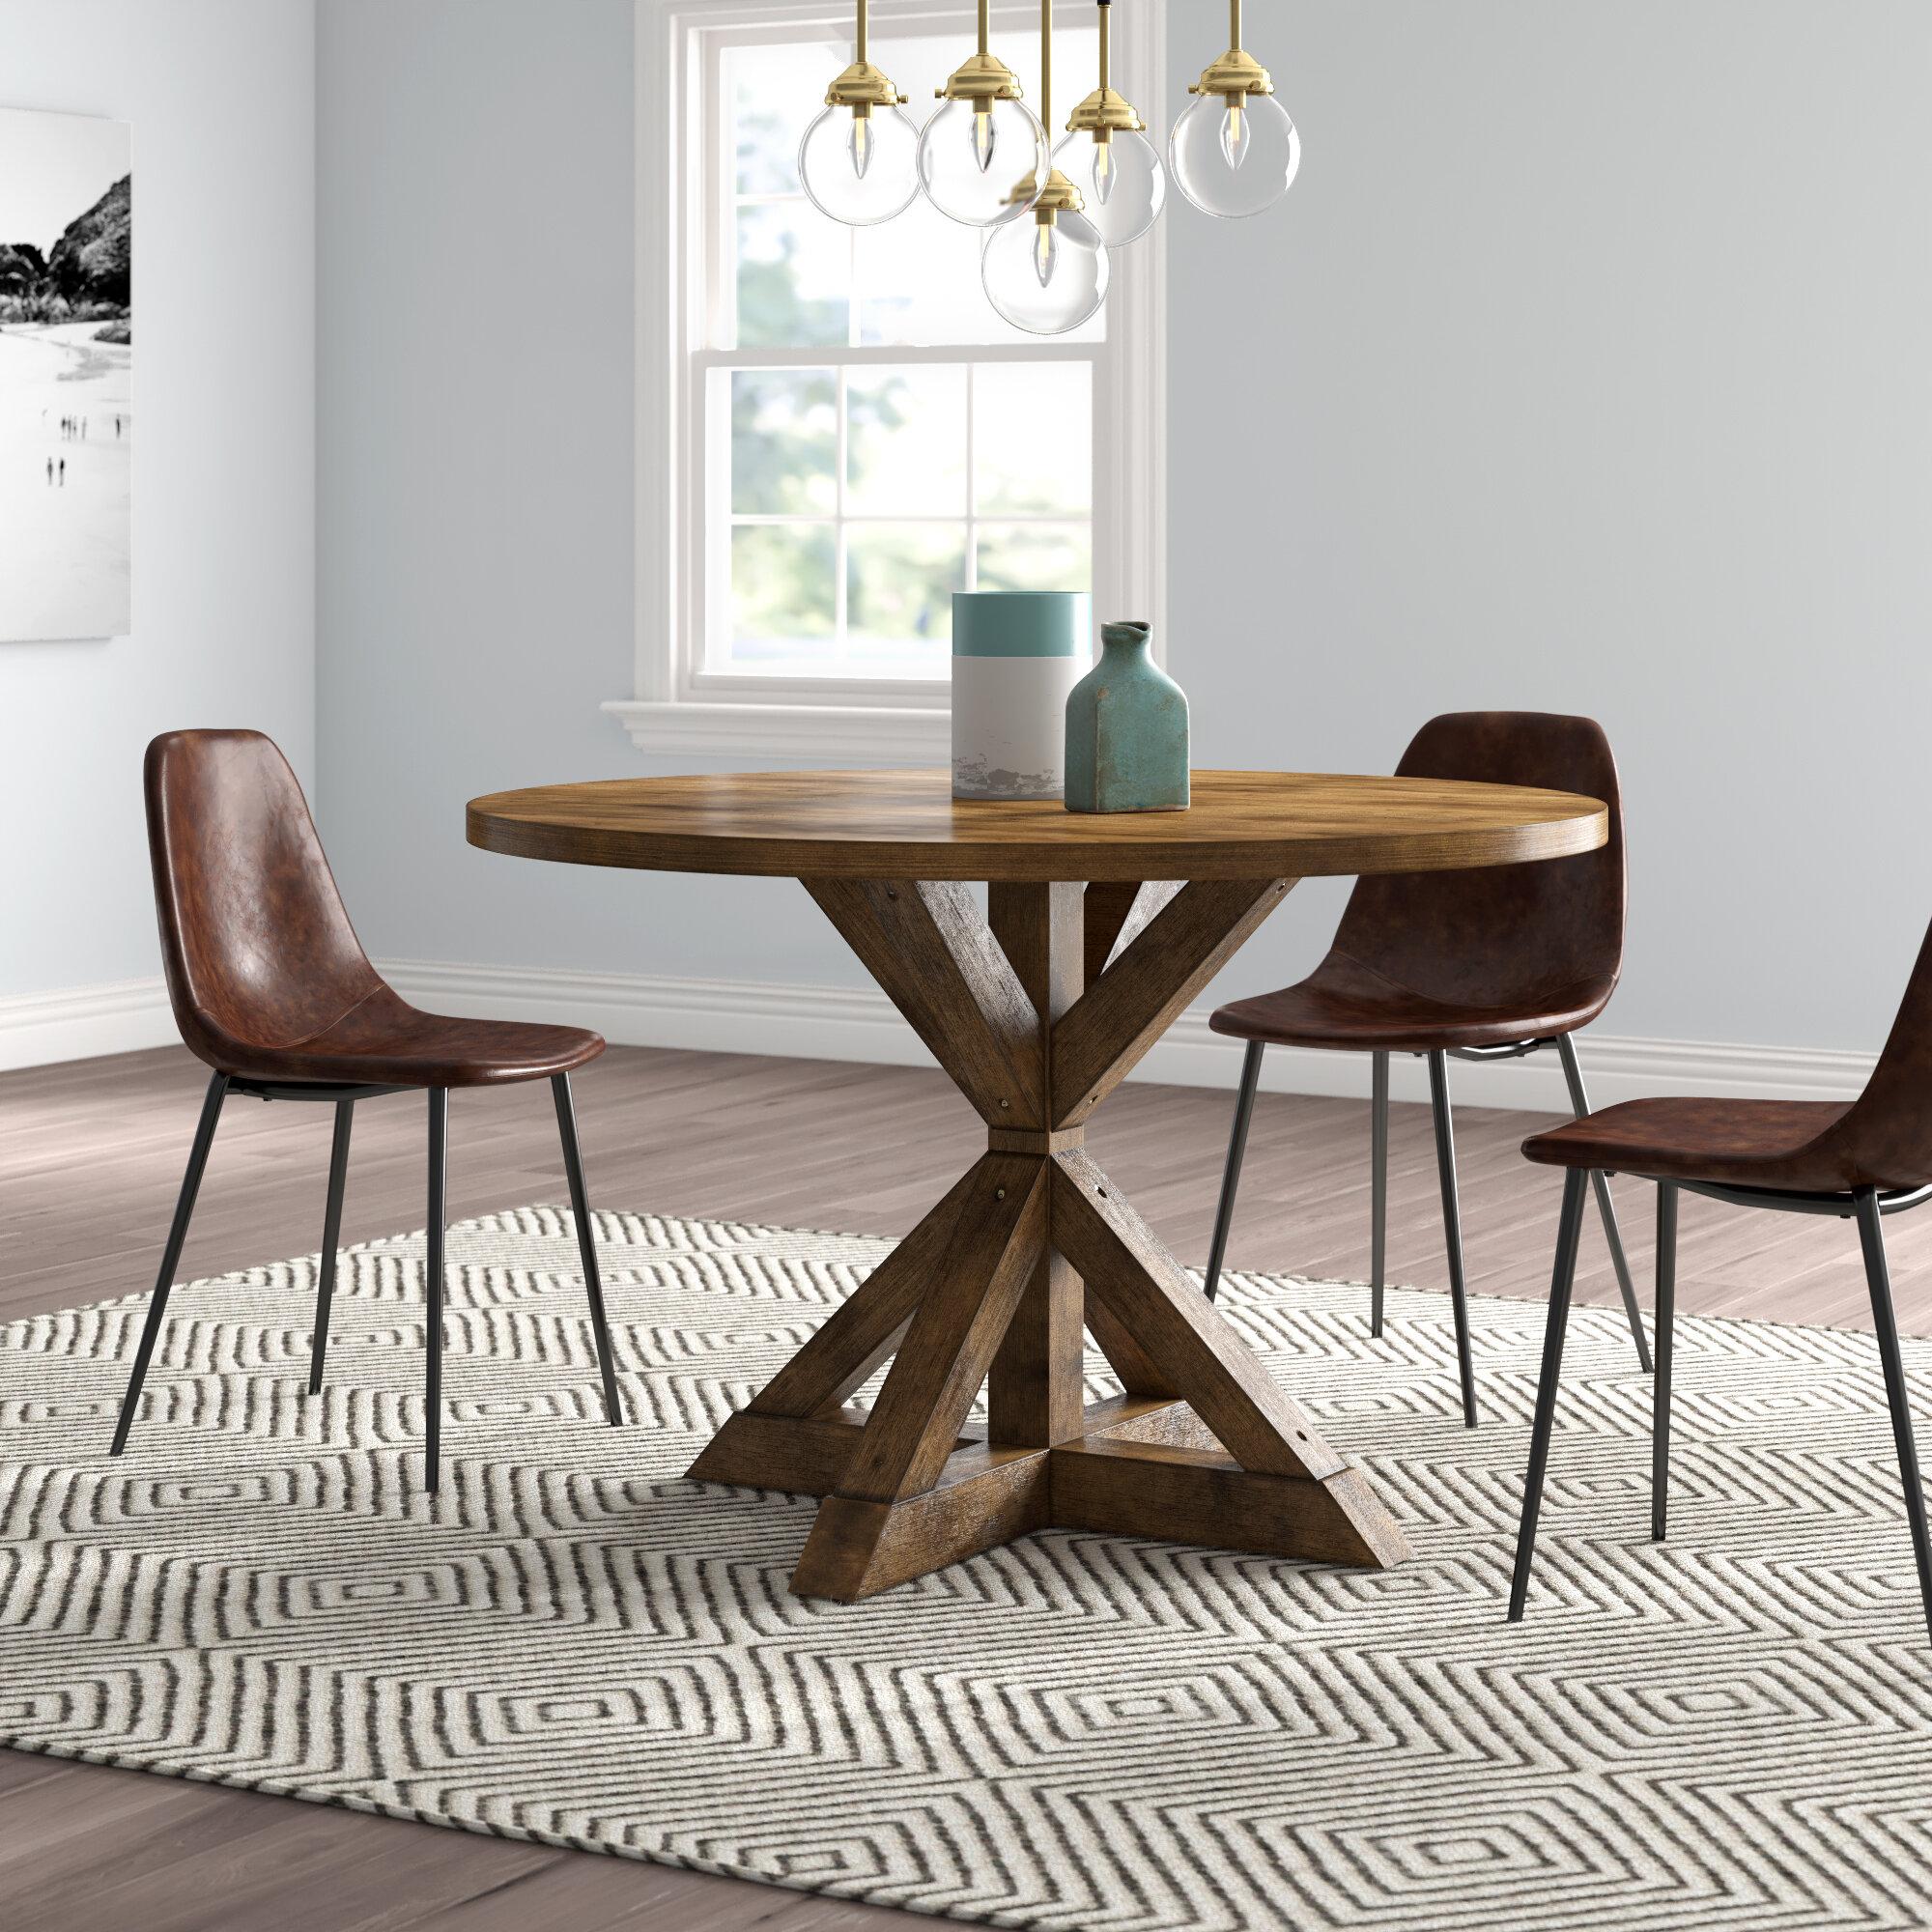 Pauletta Dining Table